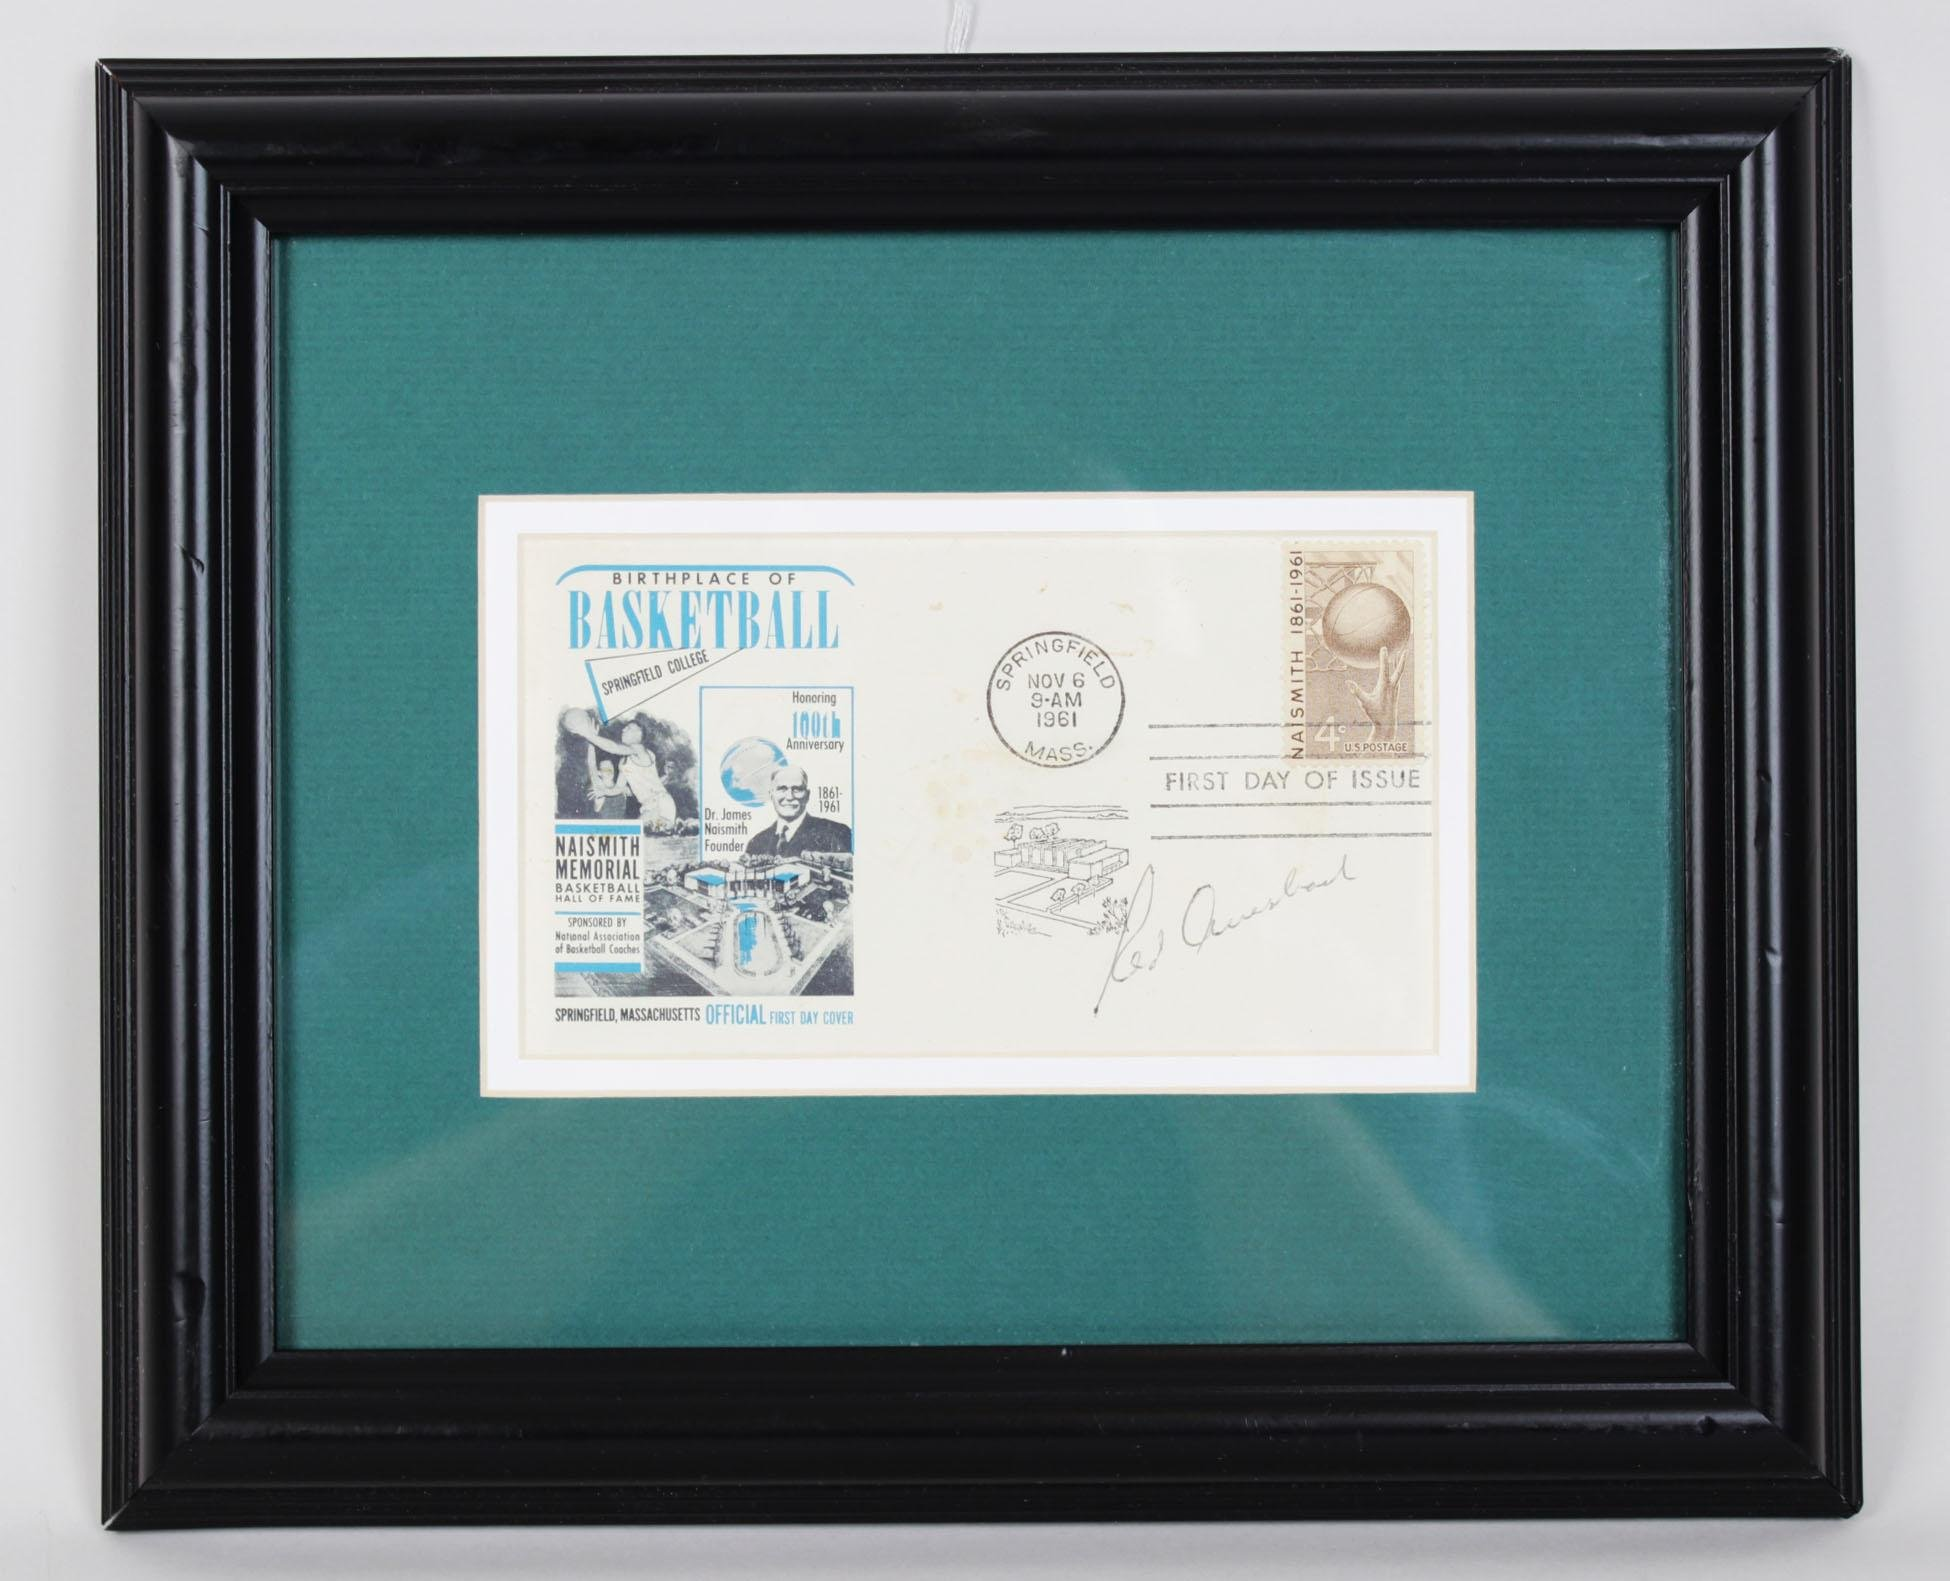 Red Auerbach Signed Cachet Display Celtics Coach COA JSA Certified NBA Cut Signatures